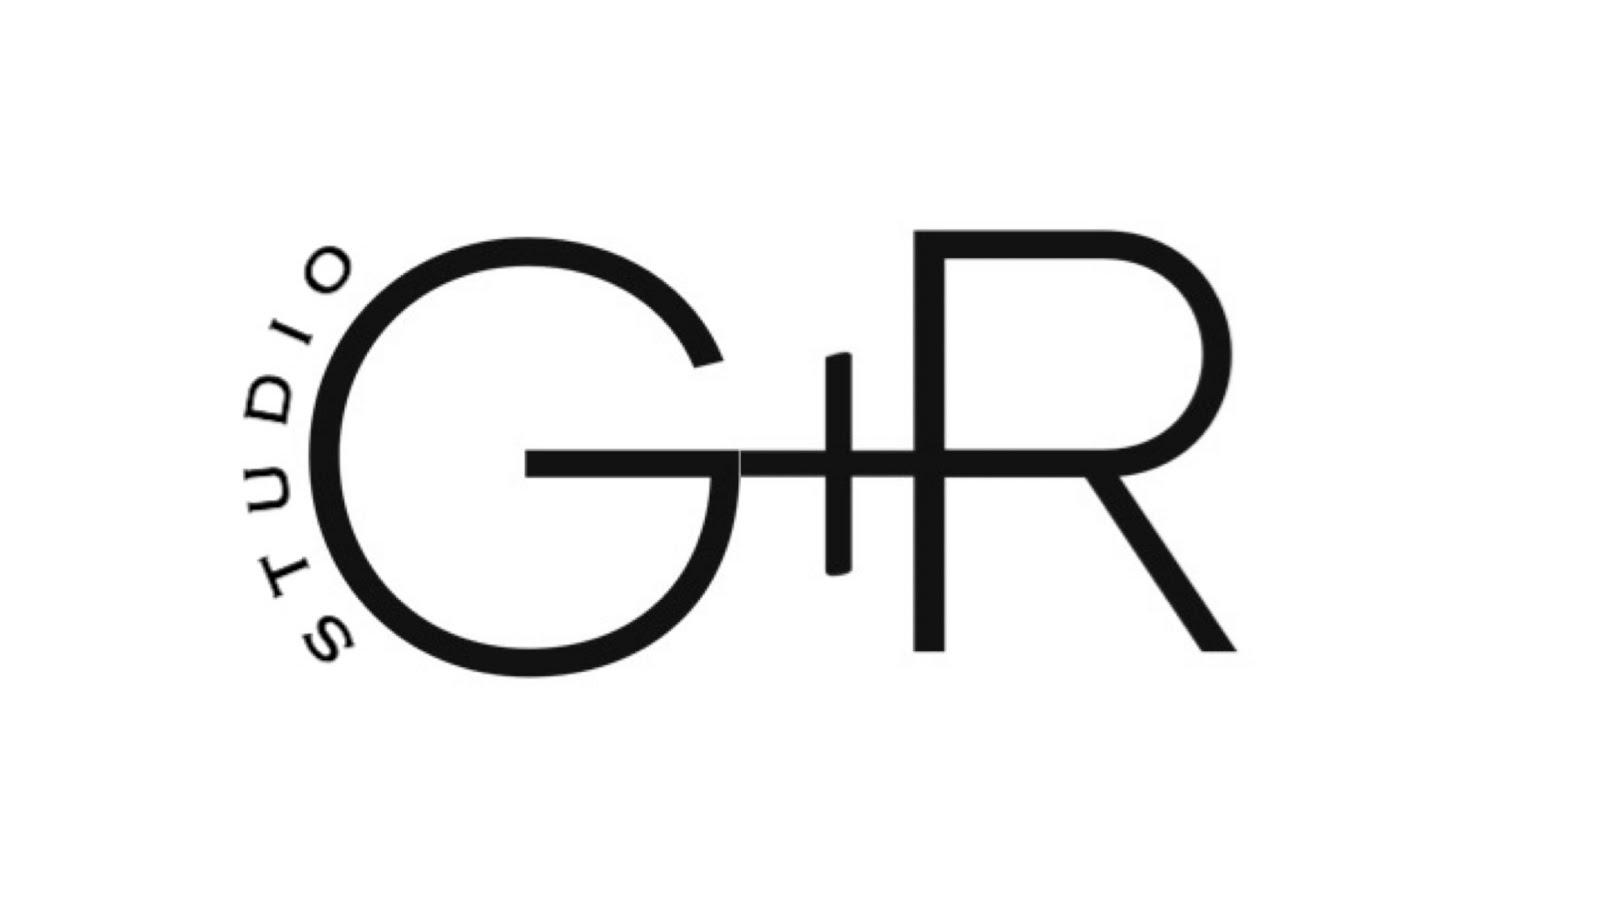 G+R studio